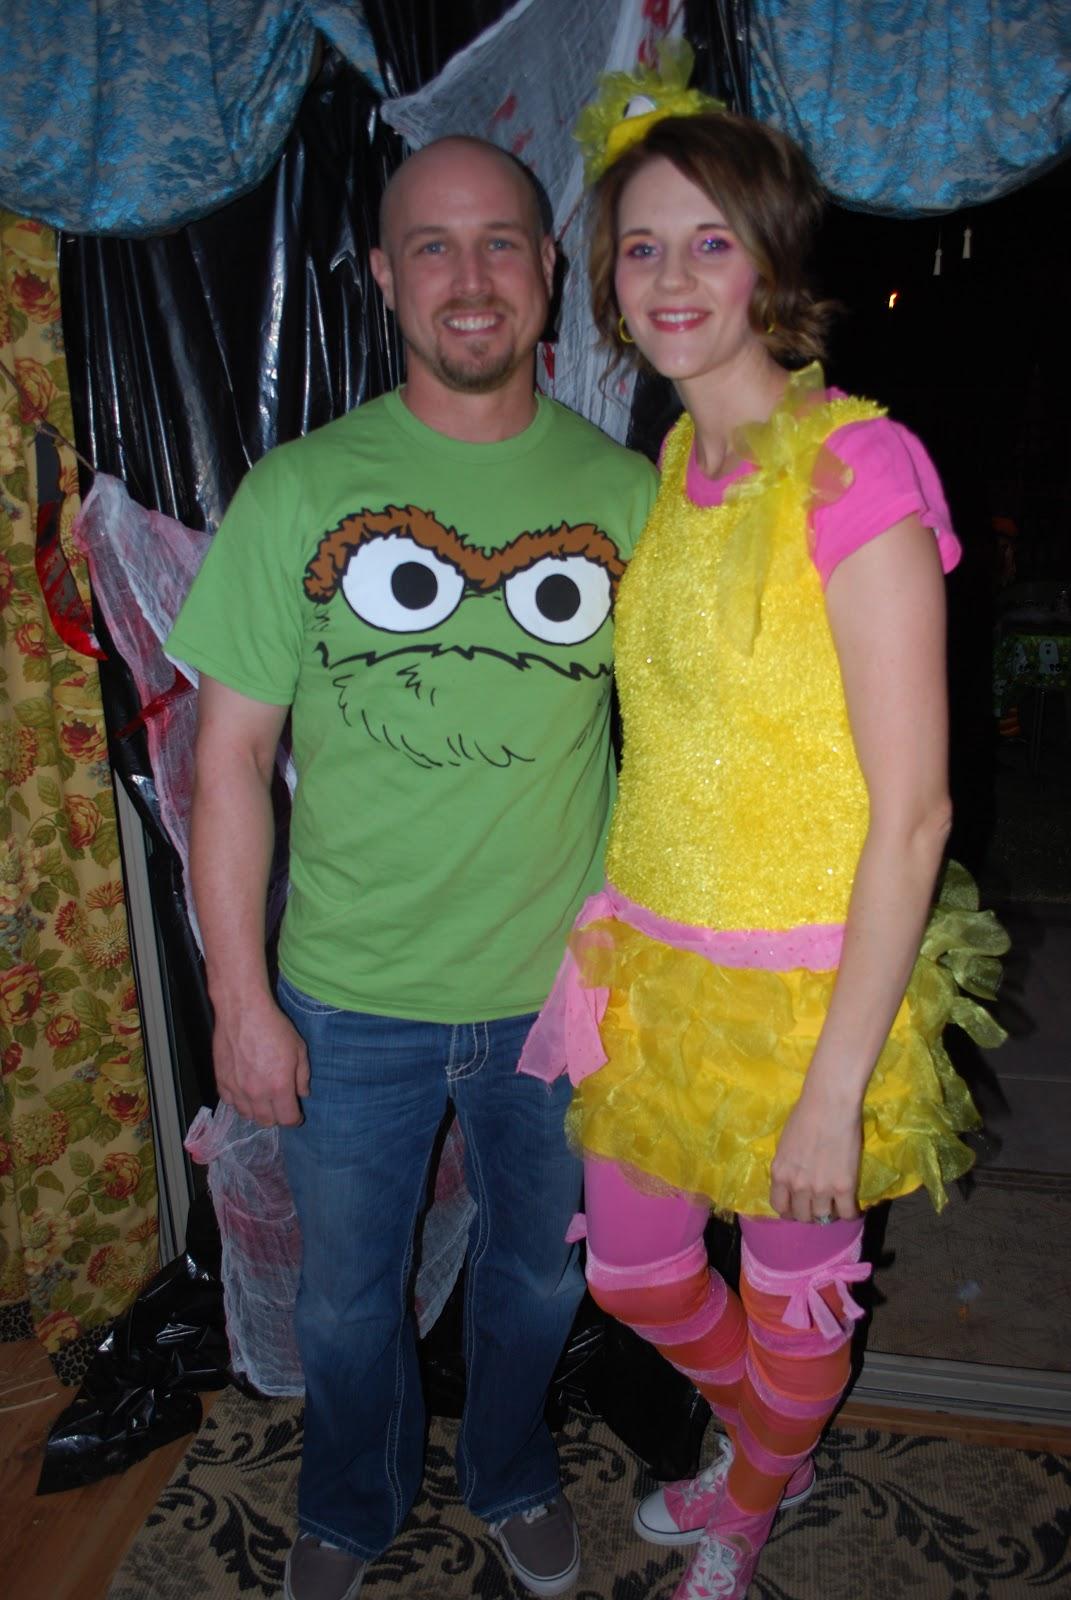 Creative Urges-Creative Blogspot Best Homemade Costume Ideas/ Best Halloween Costume Ideas/Couple Costume Ideas Part 2  sc 1 st  Creative Urges-Creative Blogspot & Creative Urges-Creative Blogspot: Best Homemade Costume Ideas/ Best ...